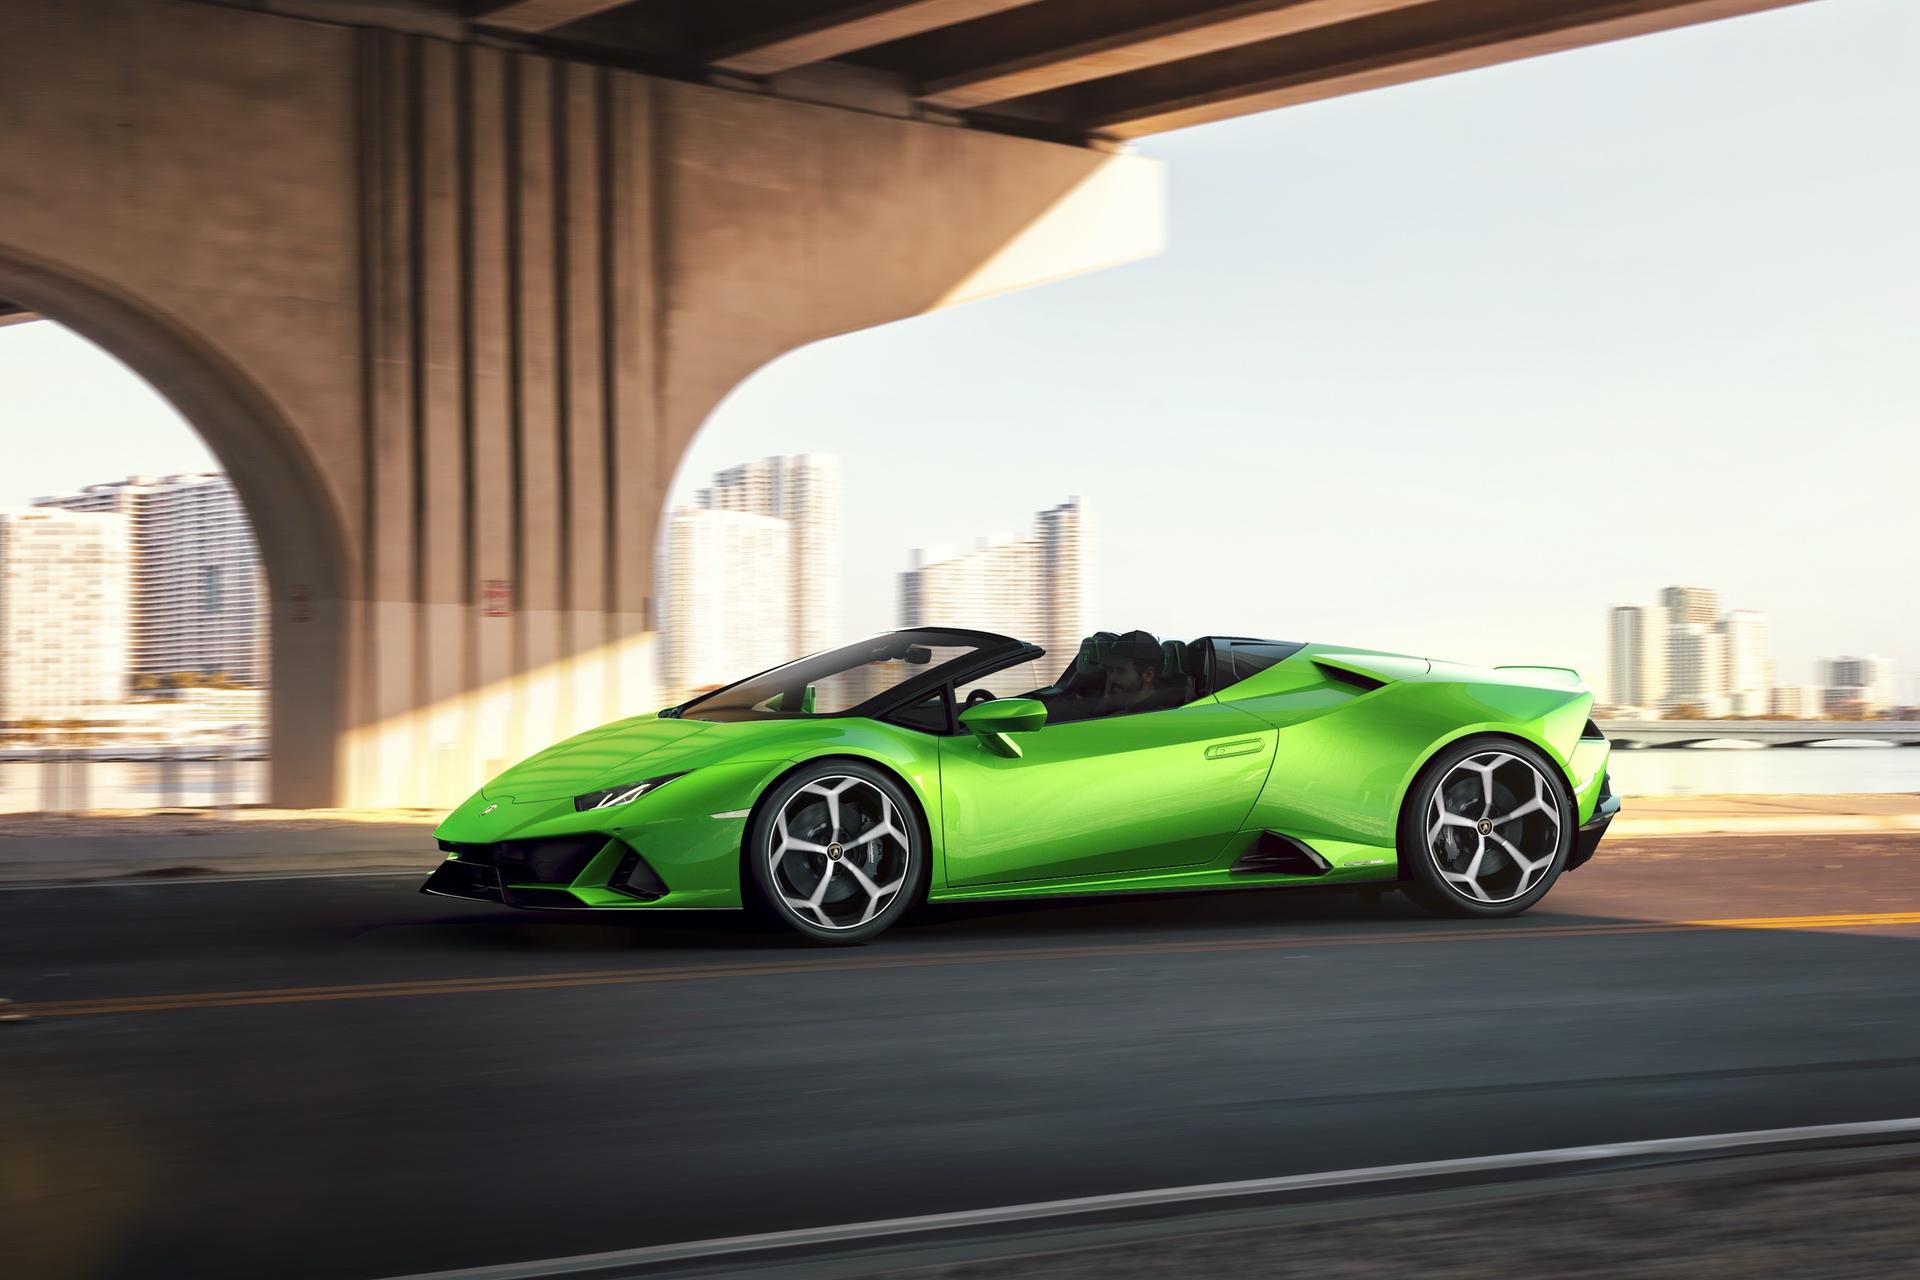 Lamborghini_Huracan_Evo_Spyder_0025